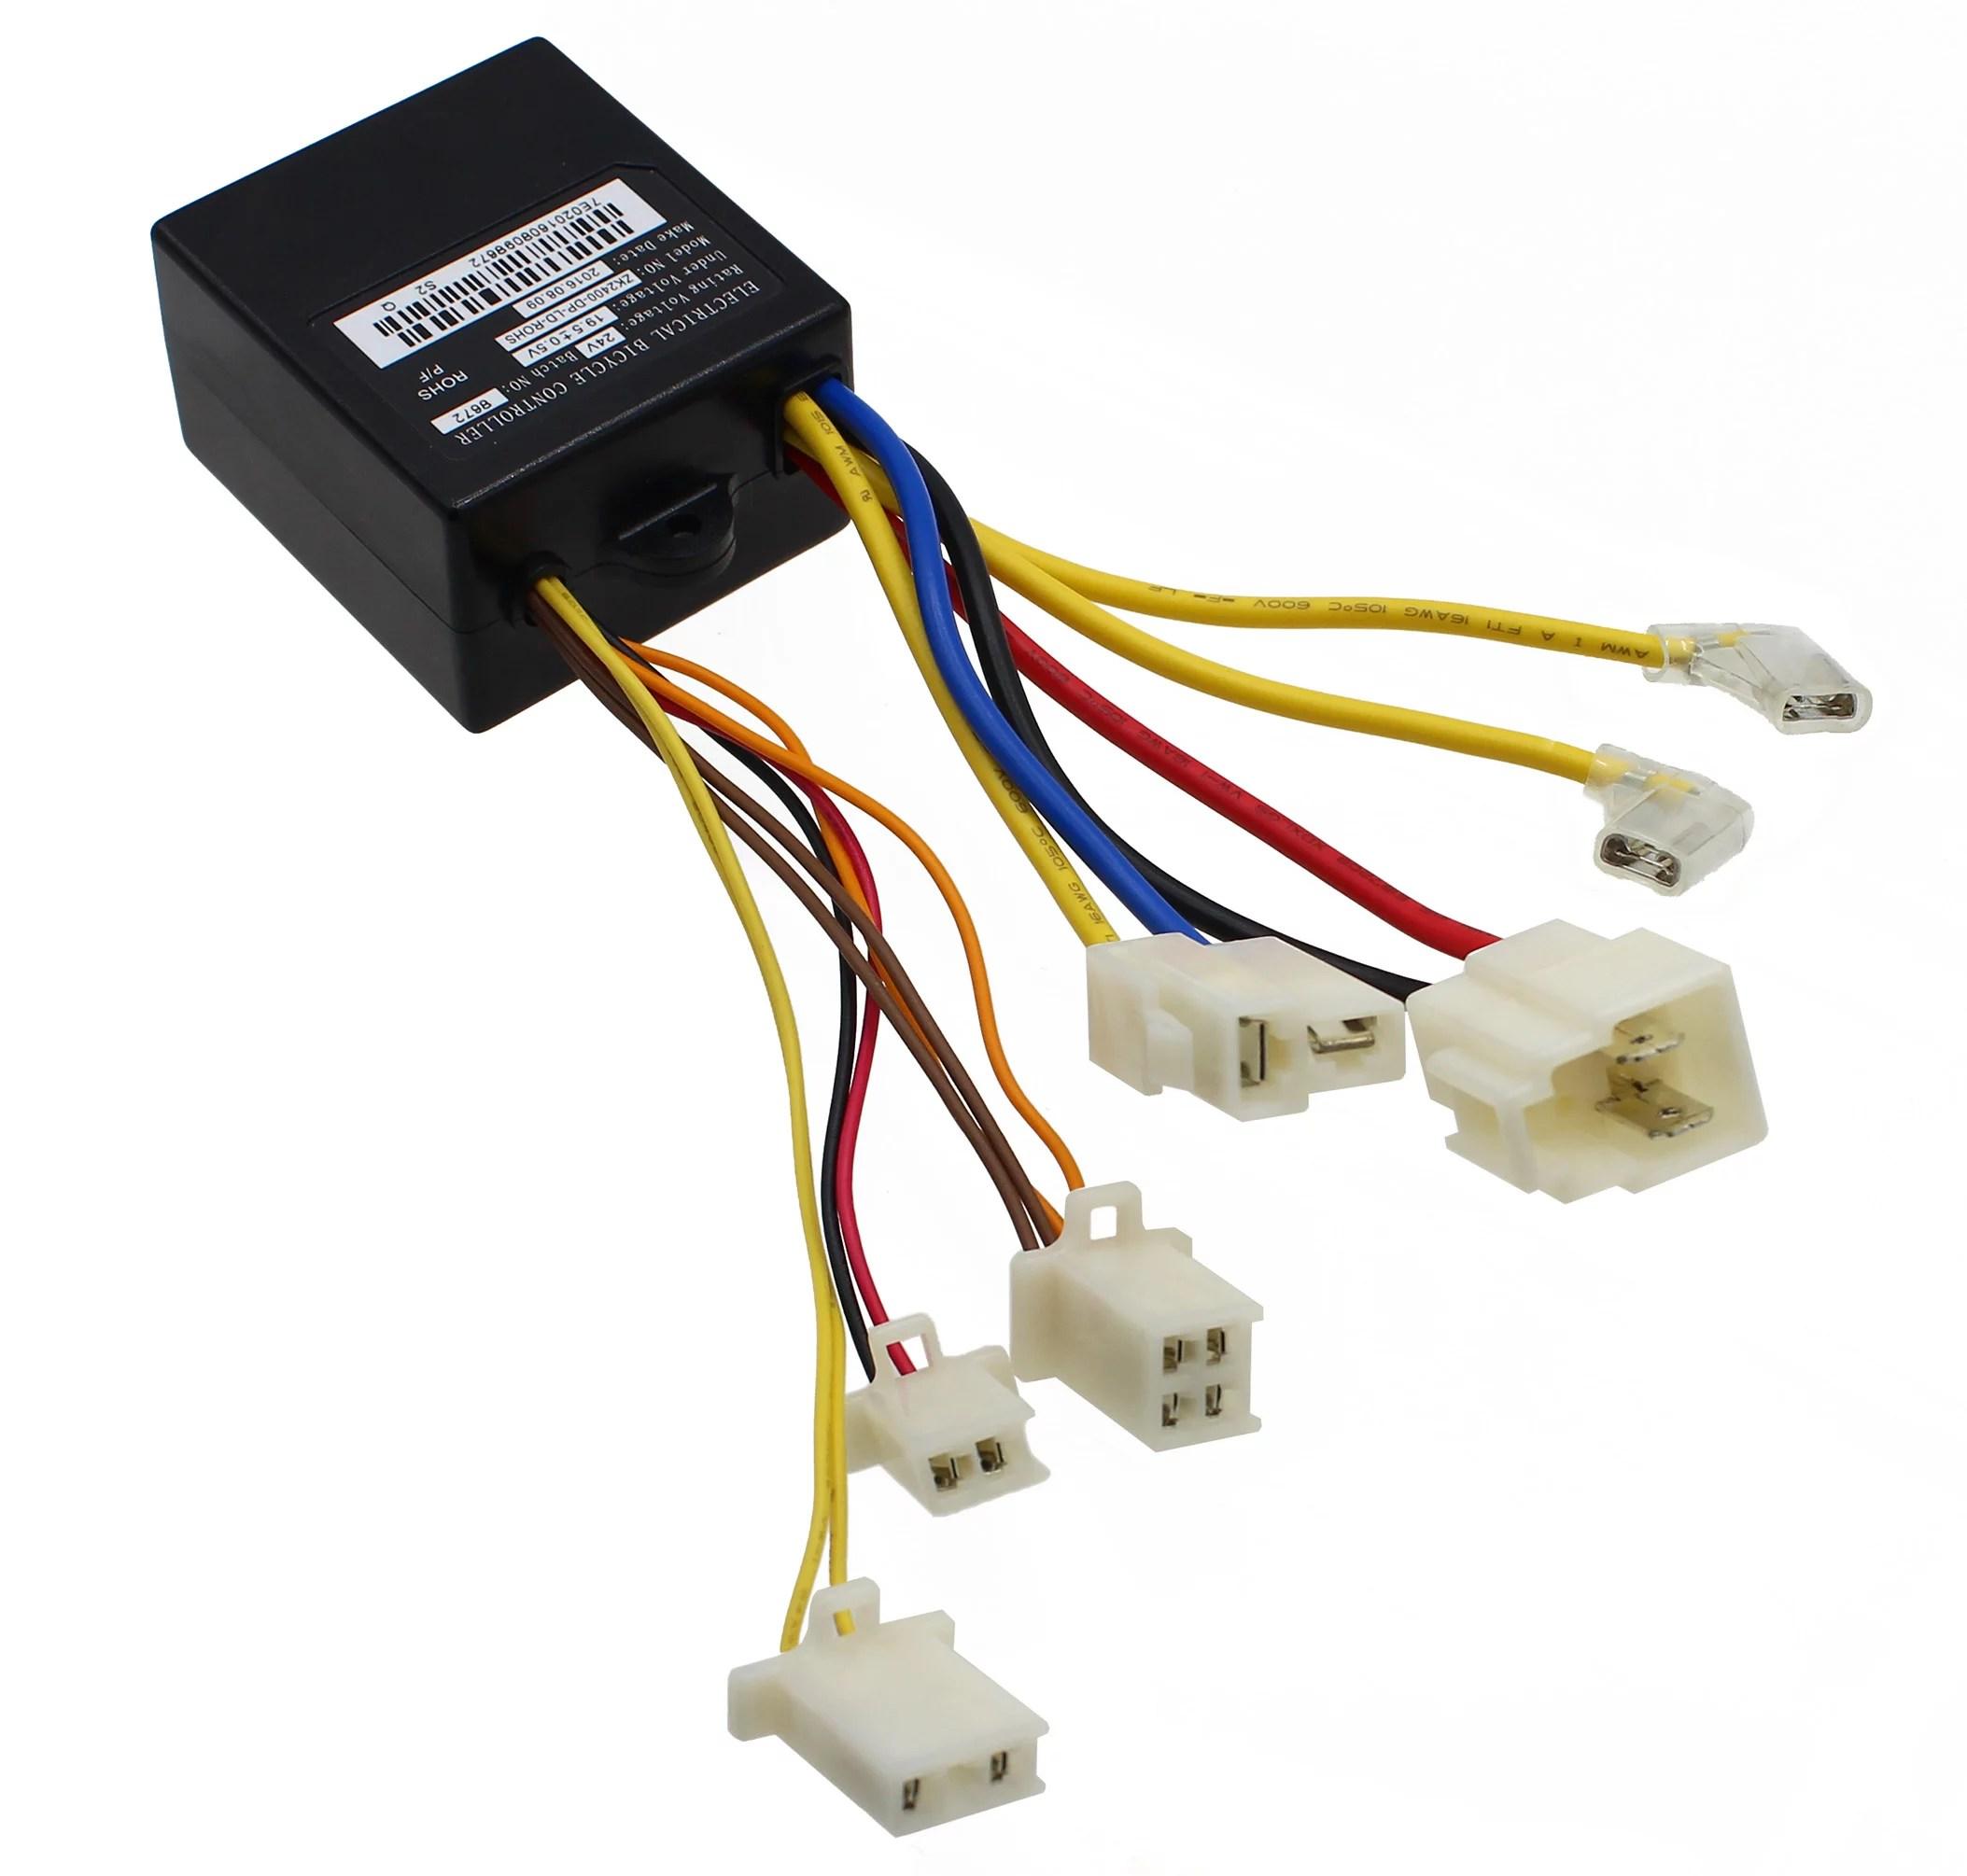 razor e100 electric scooter wiring diagram dayton capacitor start motor controller 7 wire e300 24v control module with connectors for v10 e125 walmart trikke e2